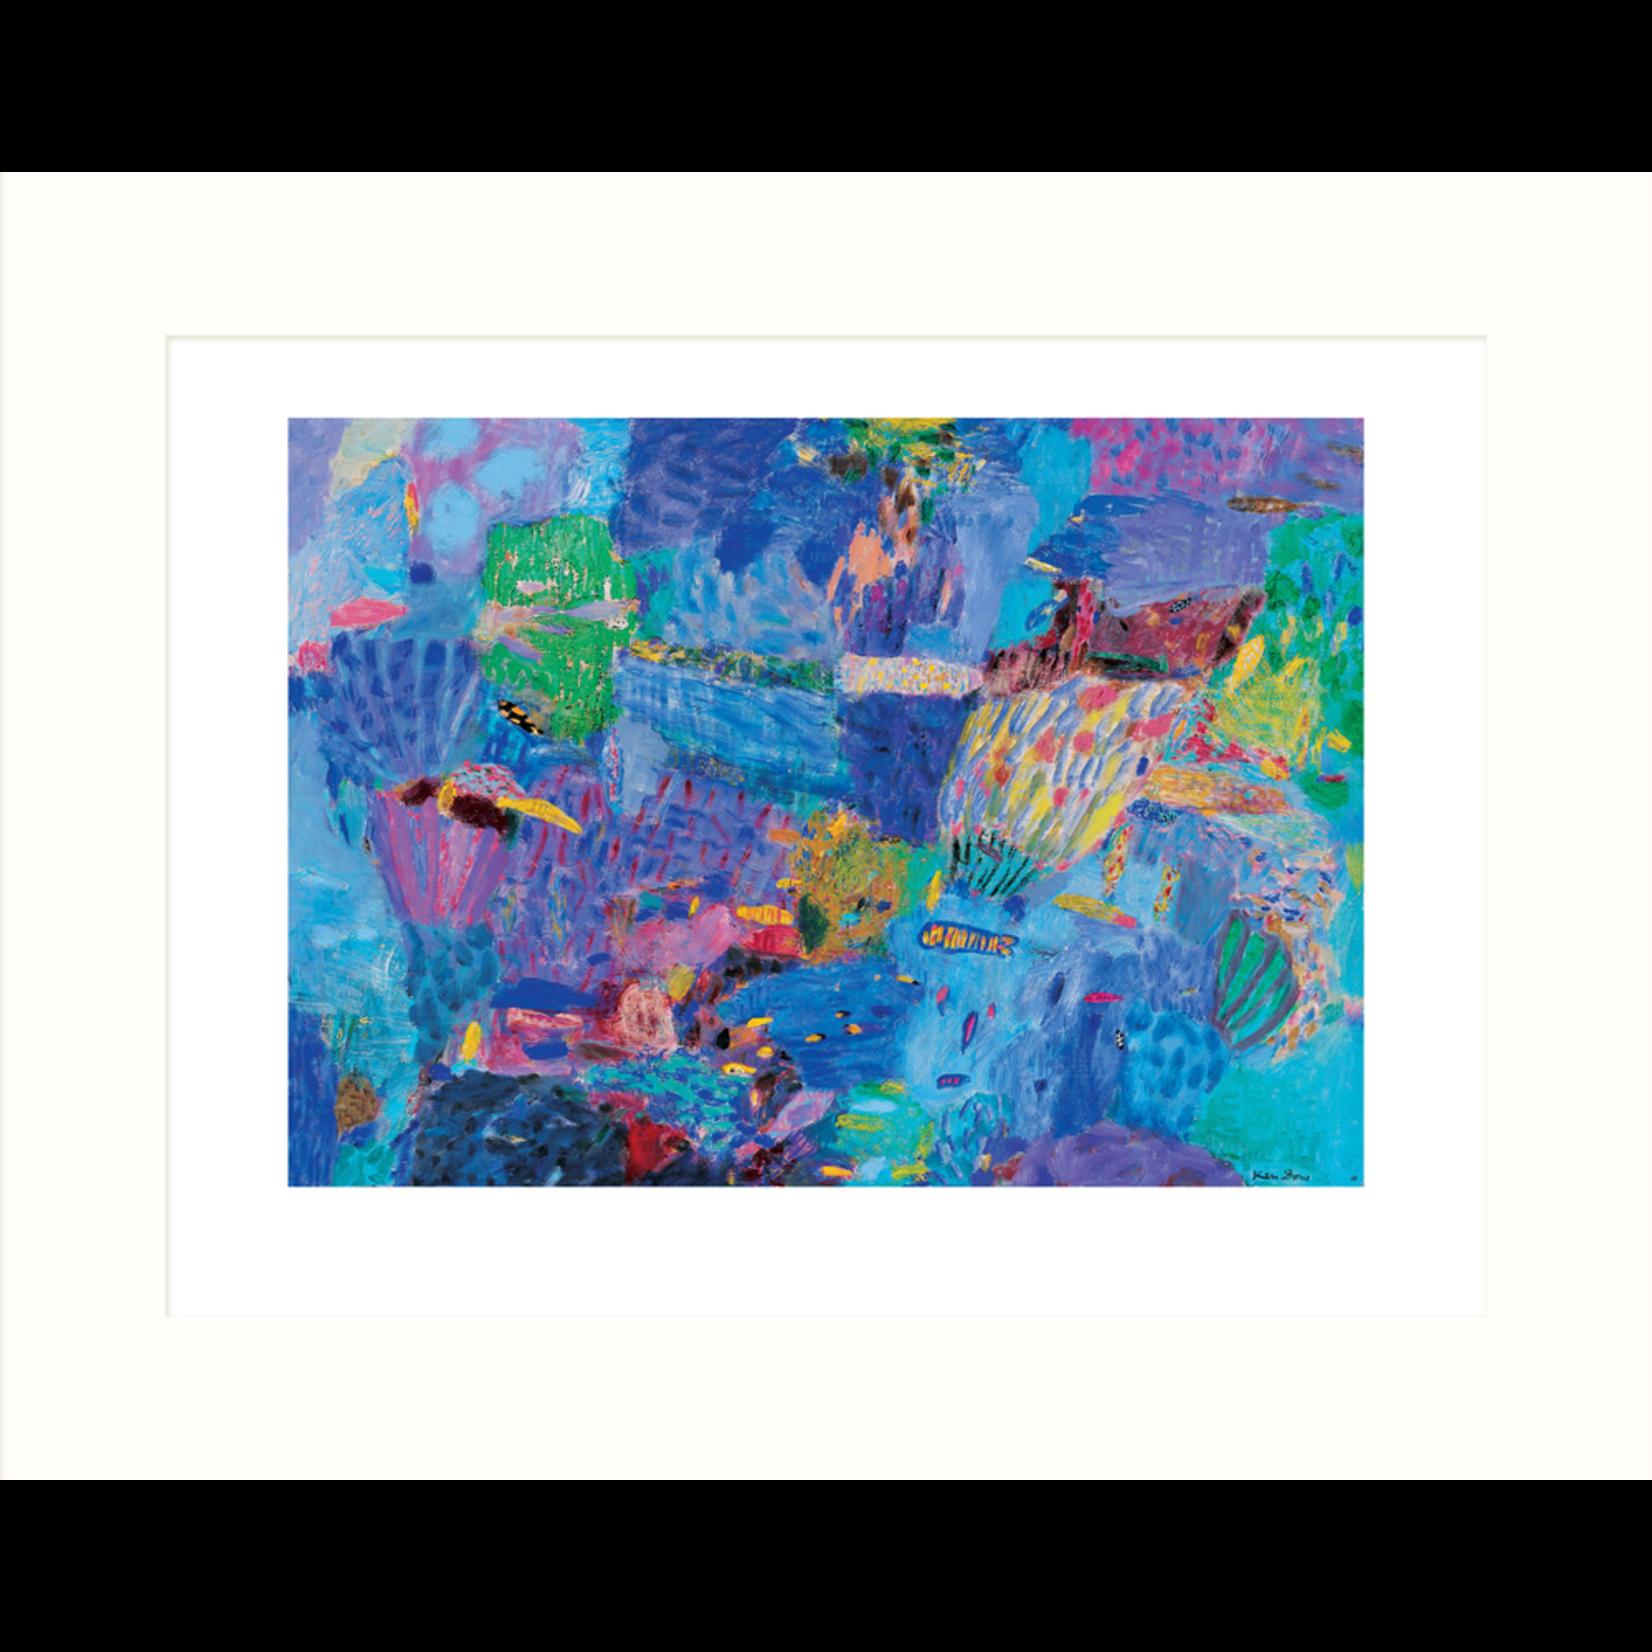 Limited Edition Prints Jacaranda Reef, 2003